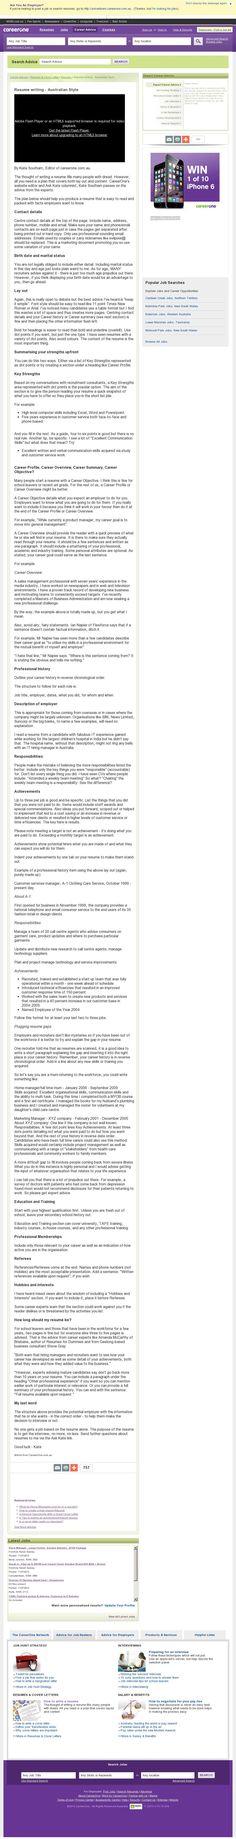 Resume Tips: http://career-advice.careerone.com.au/resume-cover-letter/resume-writing/resume-writing-the-basics/article.aspx (courtesy of @Pinstamatic http://pinstamatic.com)